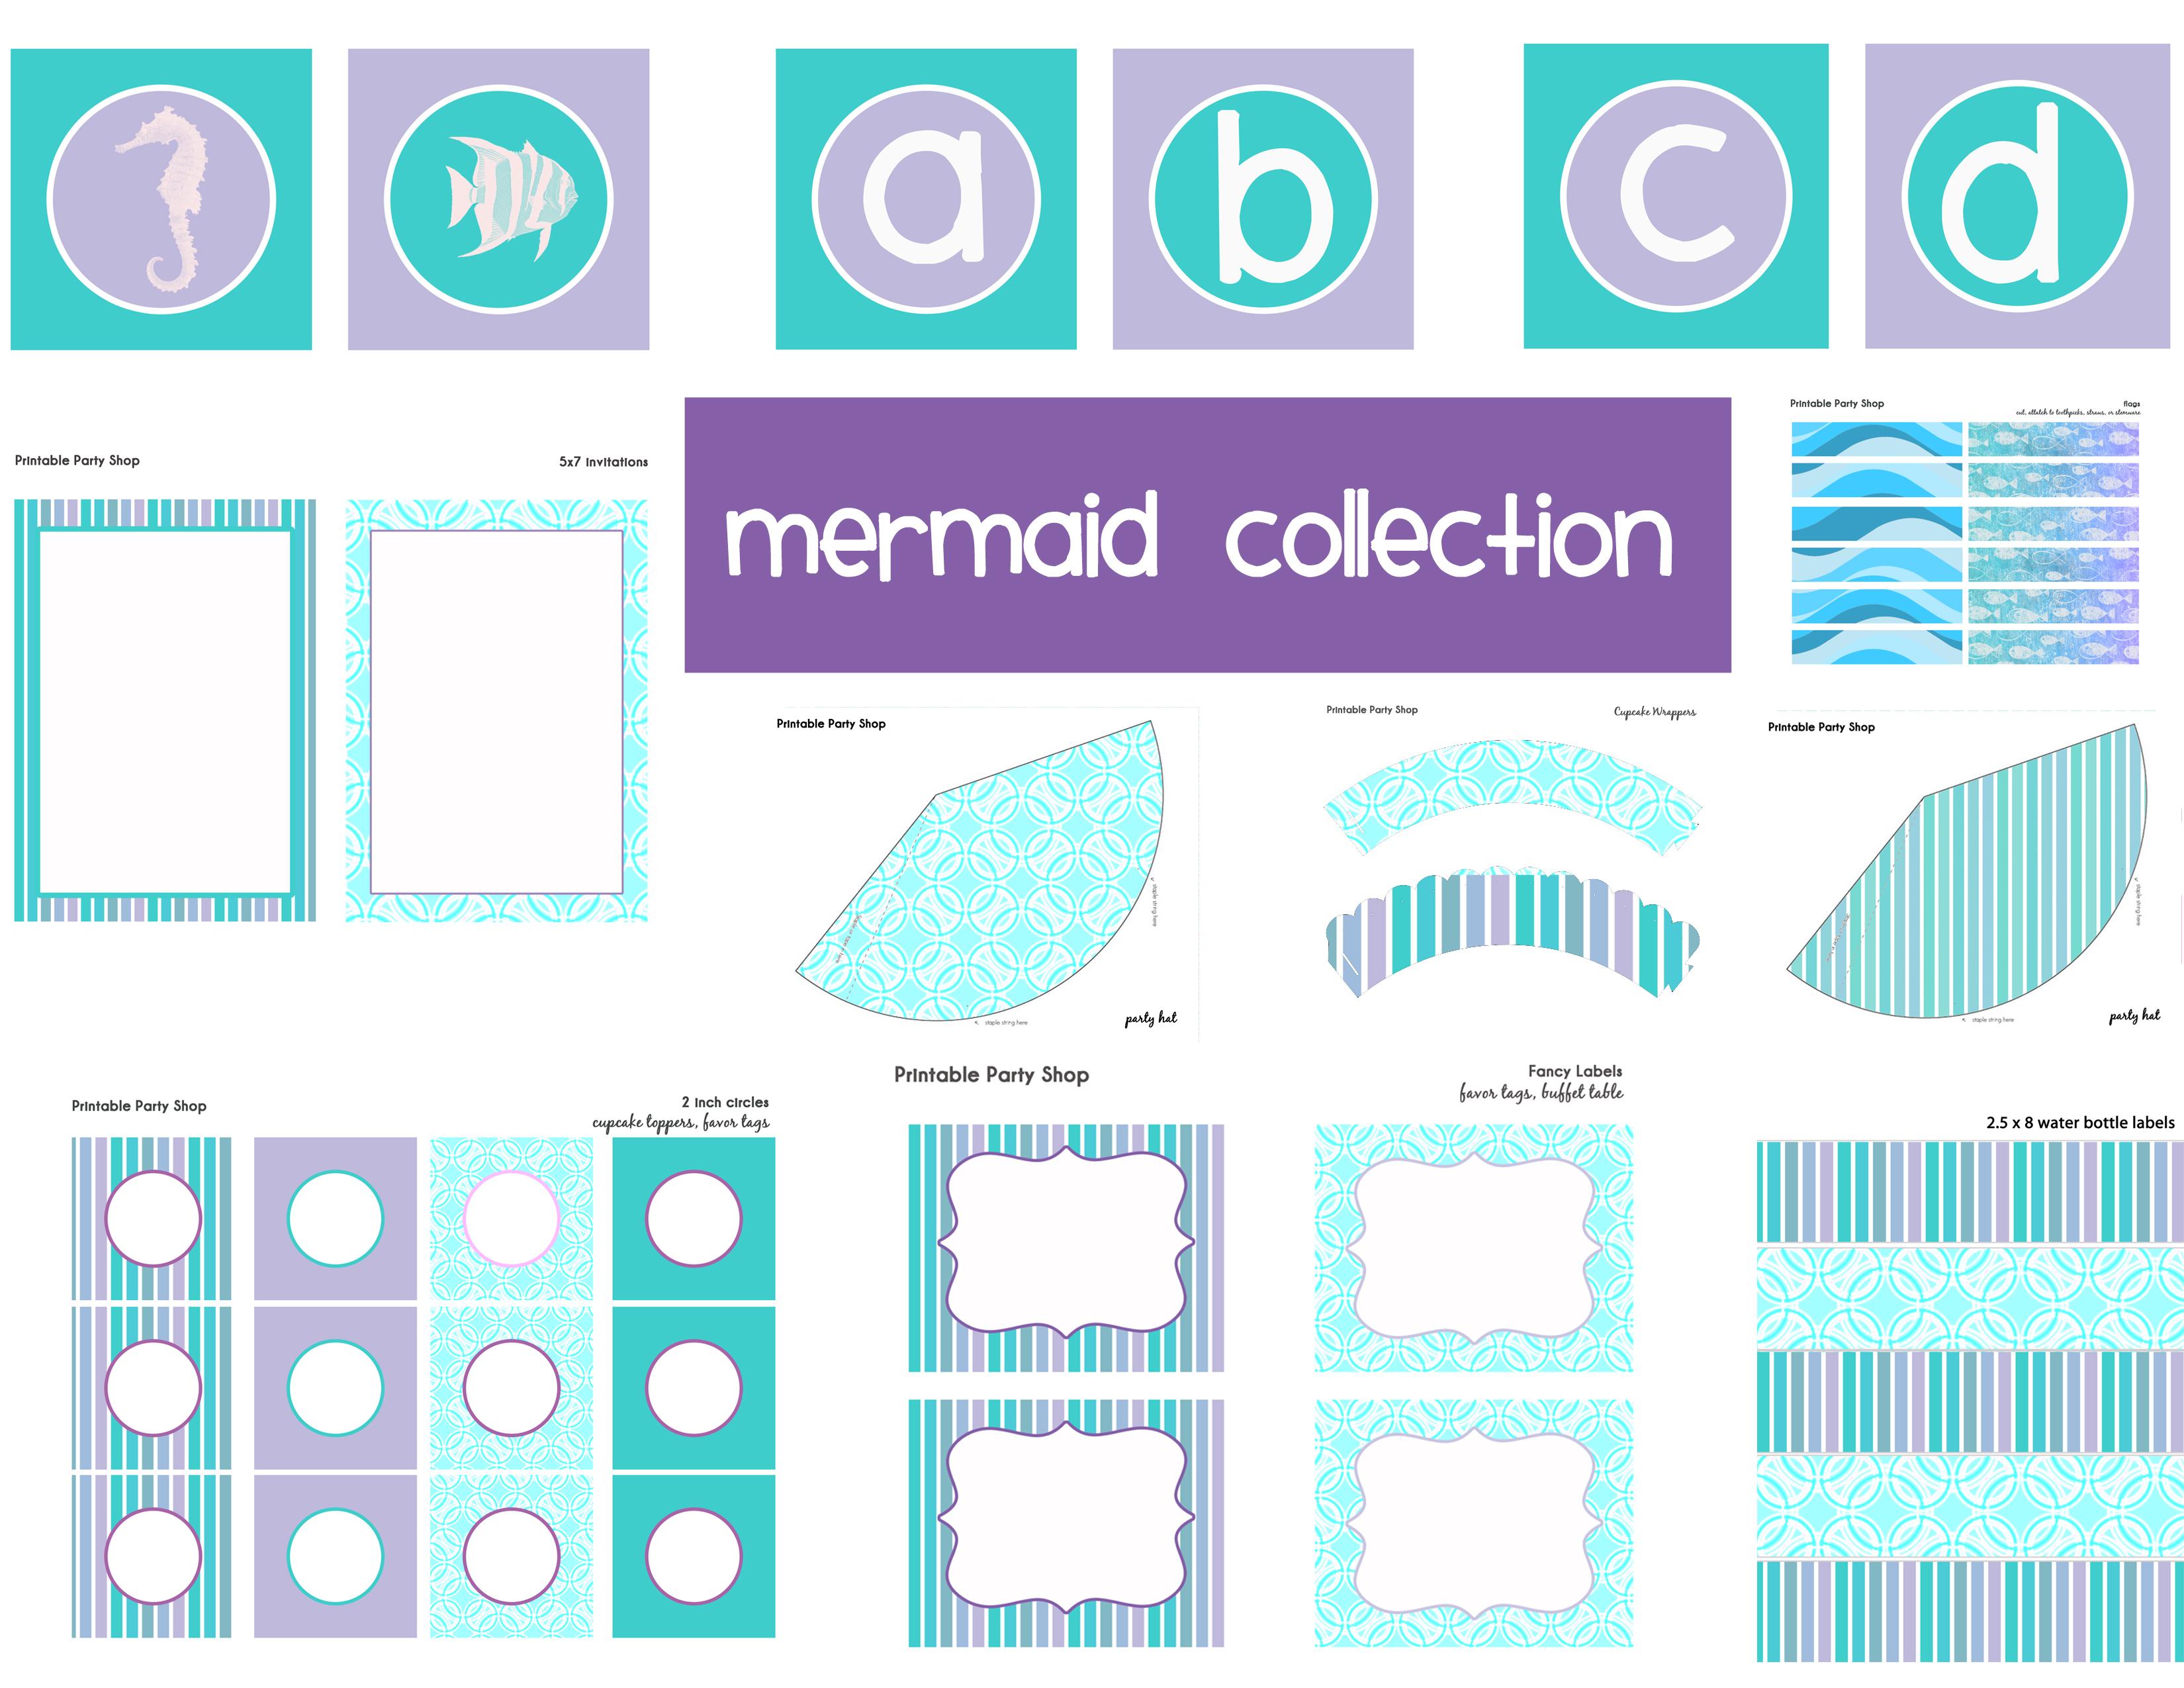 Cupcake toppers, Mermaid invitations and Mermaids on Pinterest